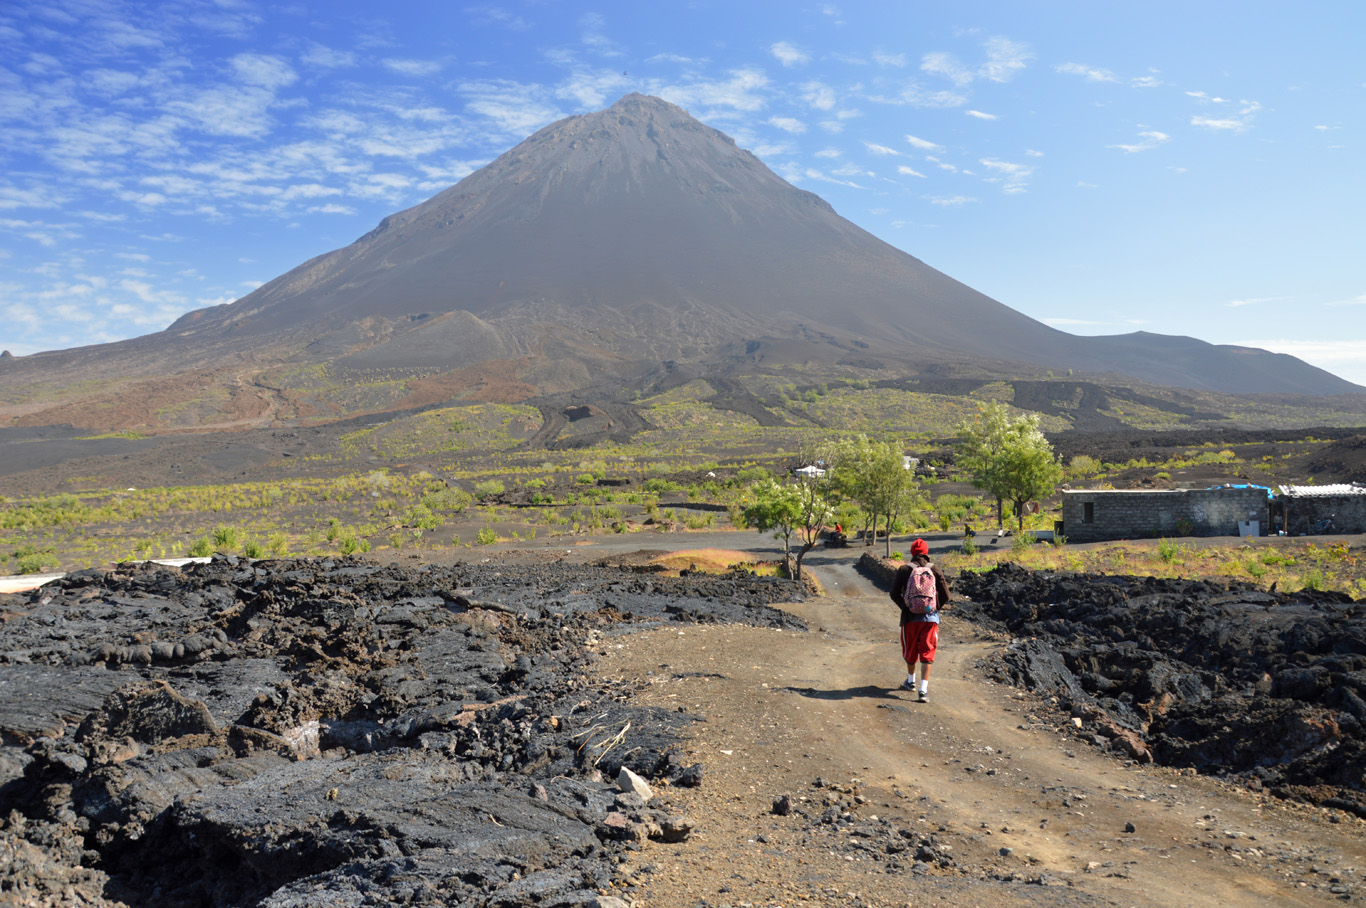 Pico do Fogo in the background